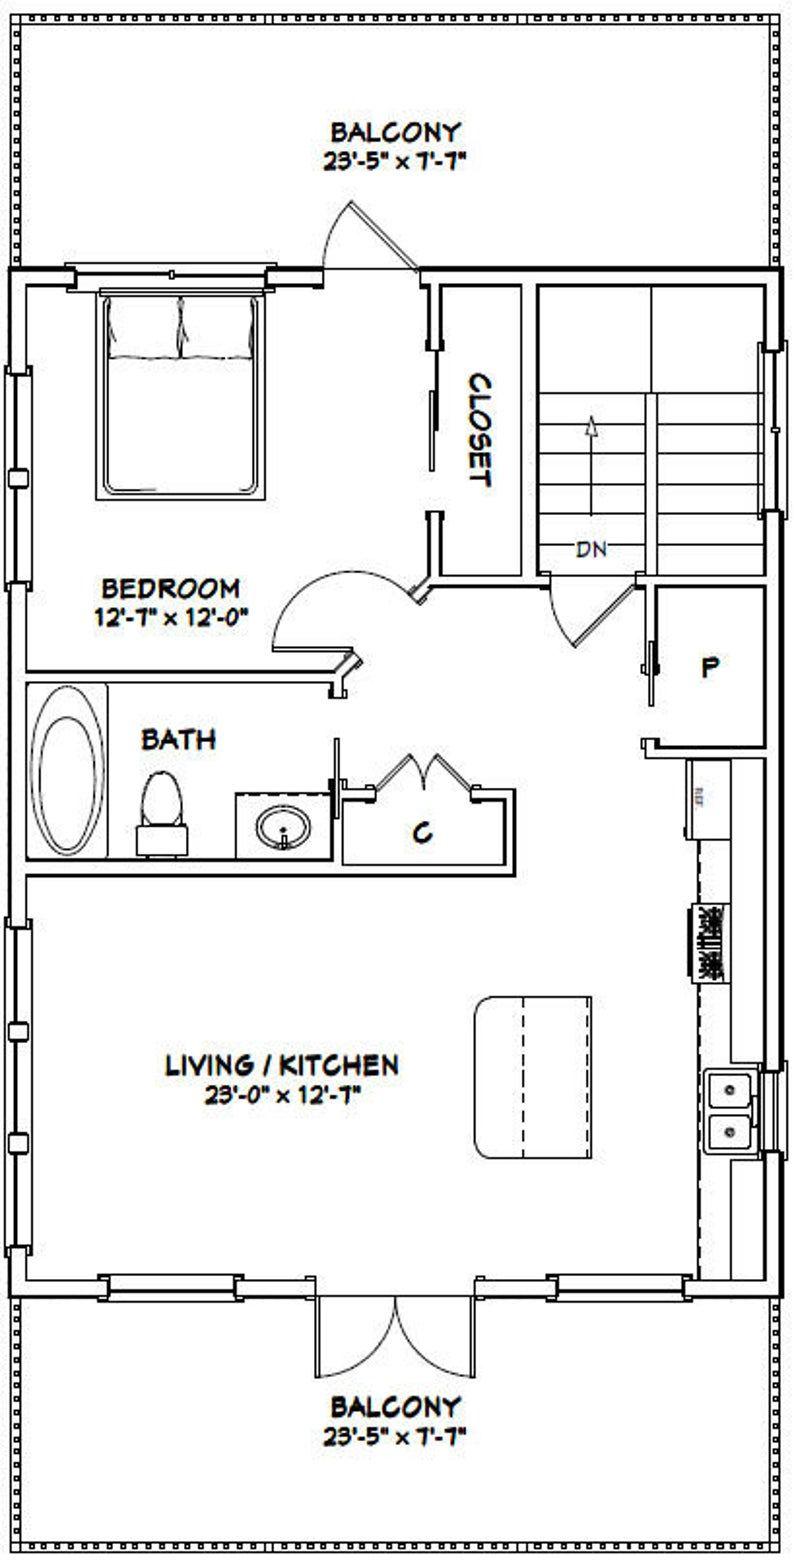 24x32 House 1 Bedroom 1 5 Bath 830 Sq Ft Pdf Floor Etsy In 2020 Floor Plans House Floor Plans Garage Apartment Plans